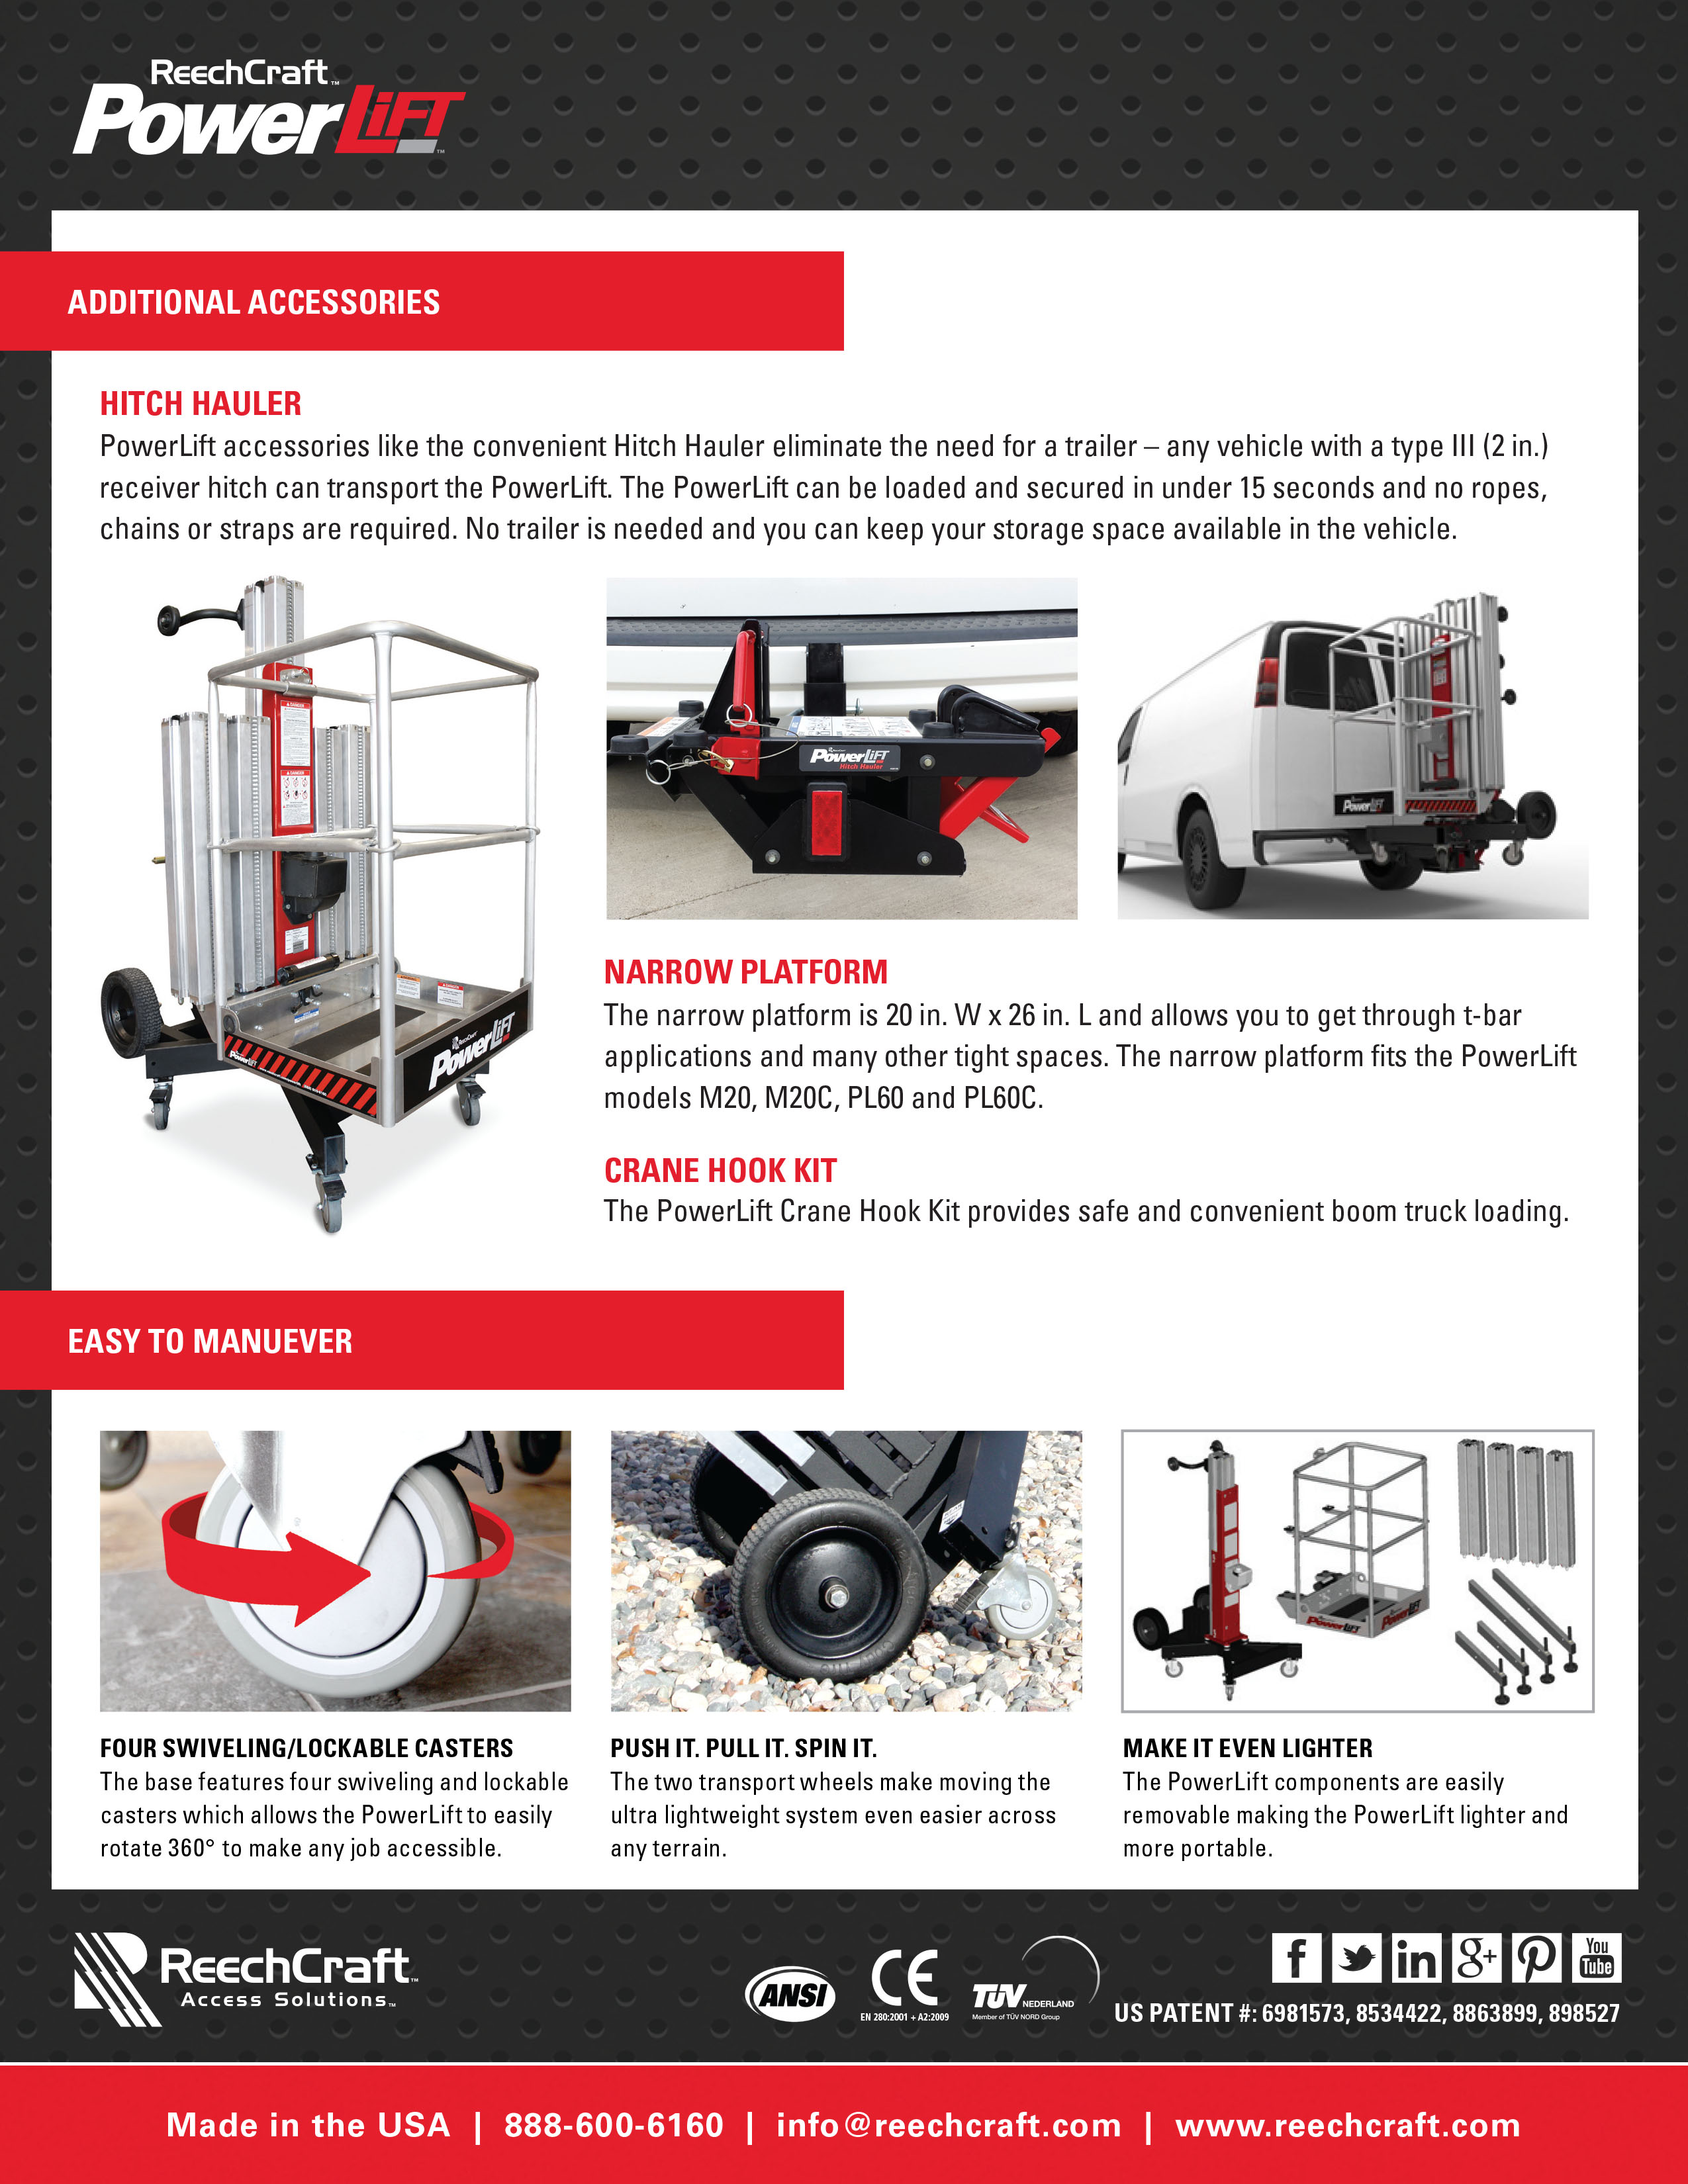 powerlift-brochure-4.jpg